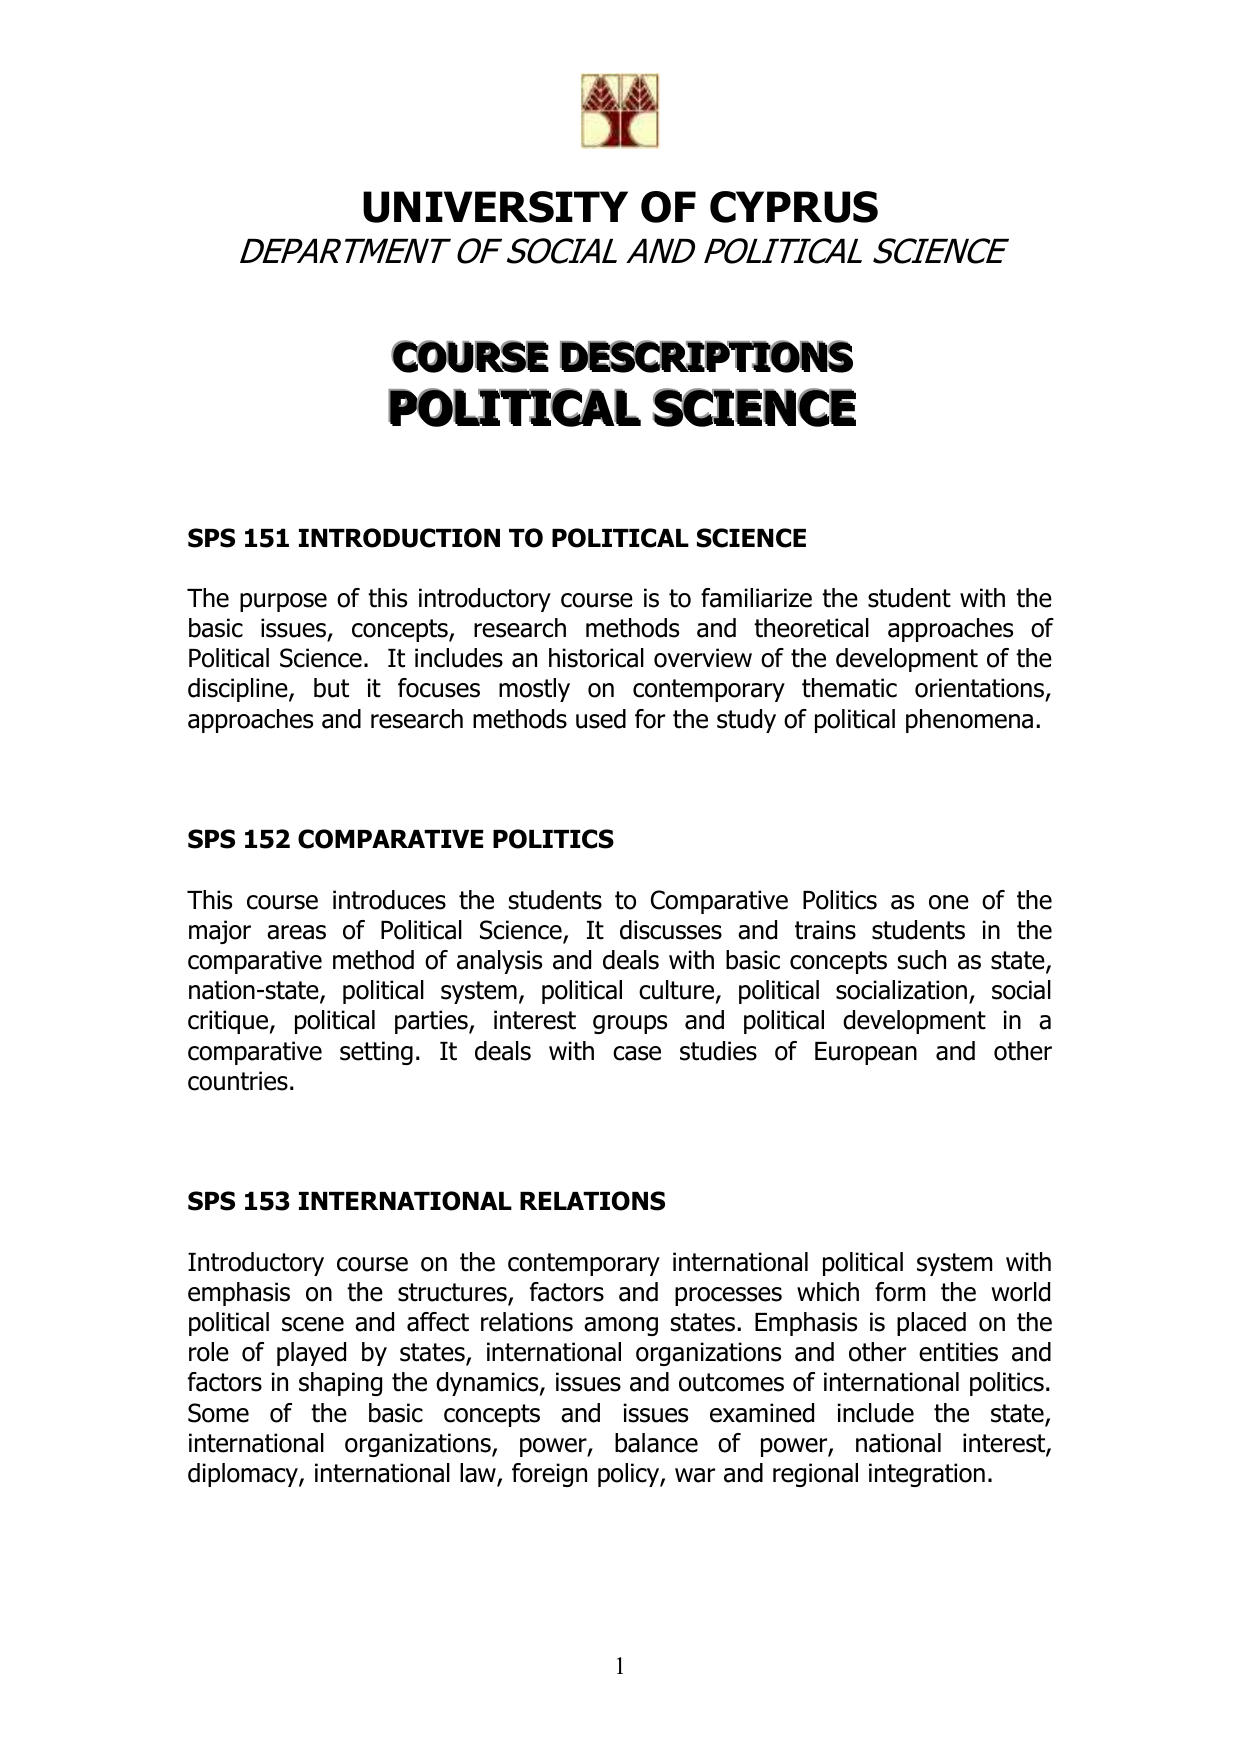 introduction to comparative politics syllabus